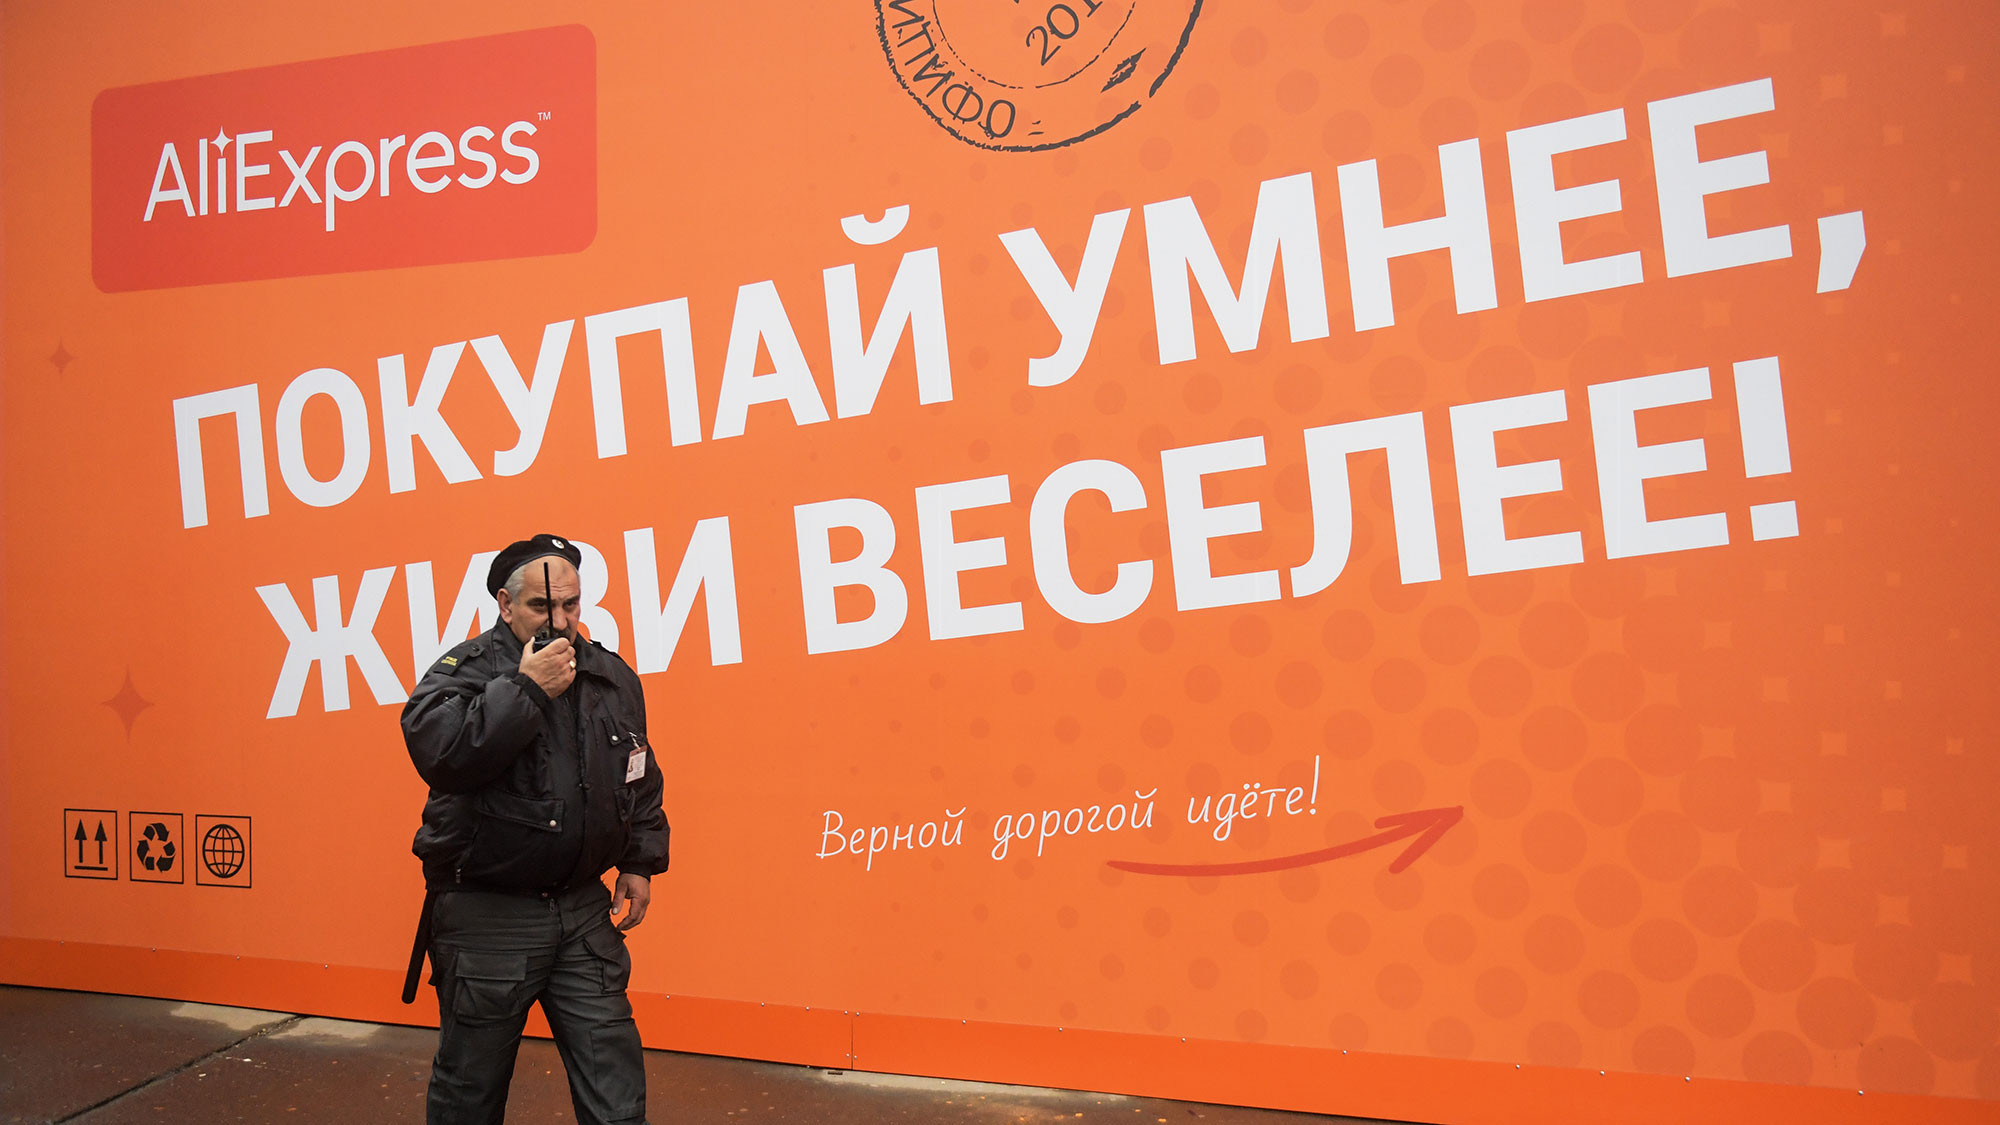 <p>Фото: &copy; РИА Новости /&nbsp;Григорий Сысоев</p>